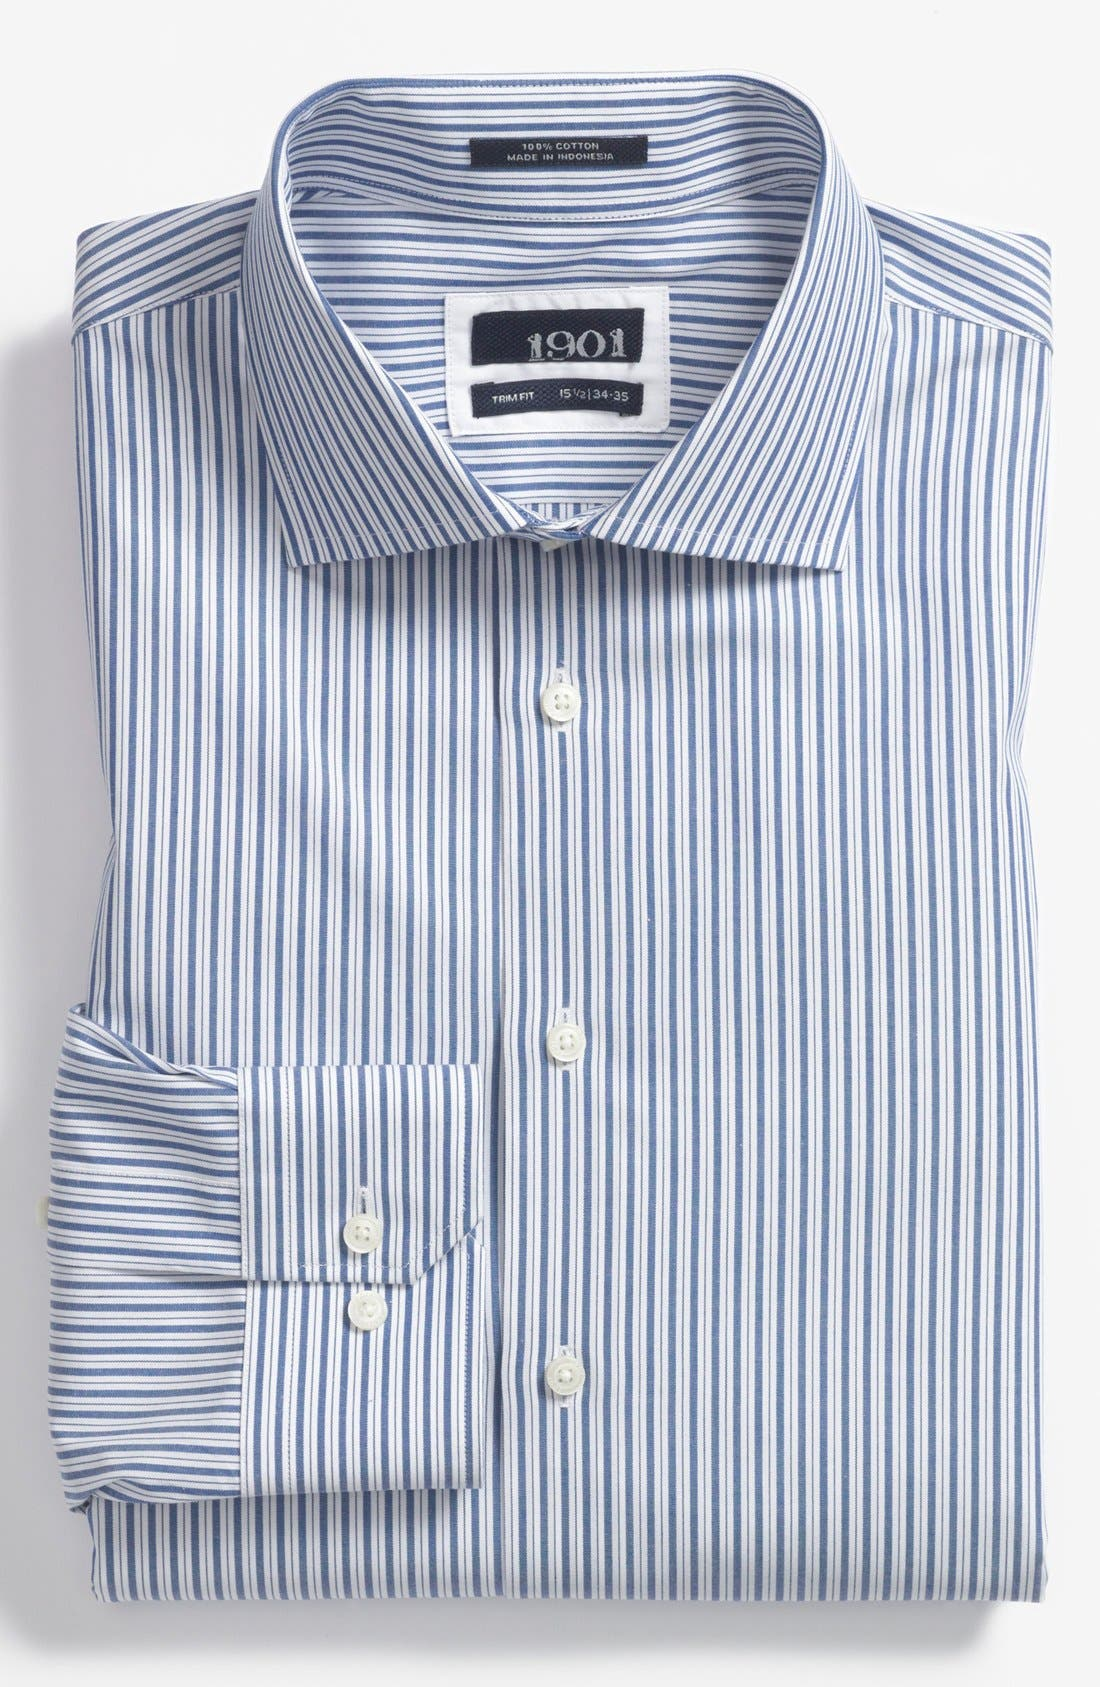 Main Image - 1901 Trim Fit Dress Shirt